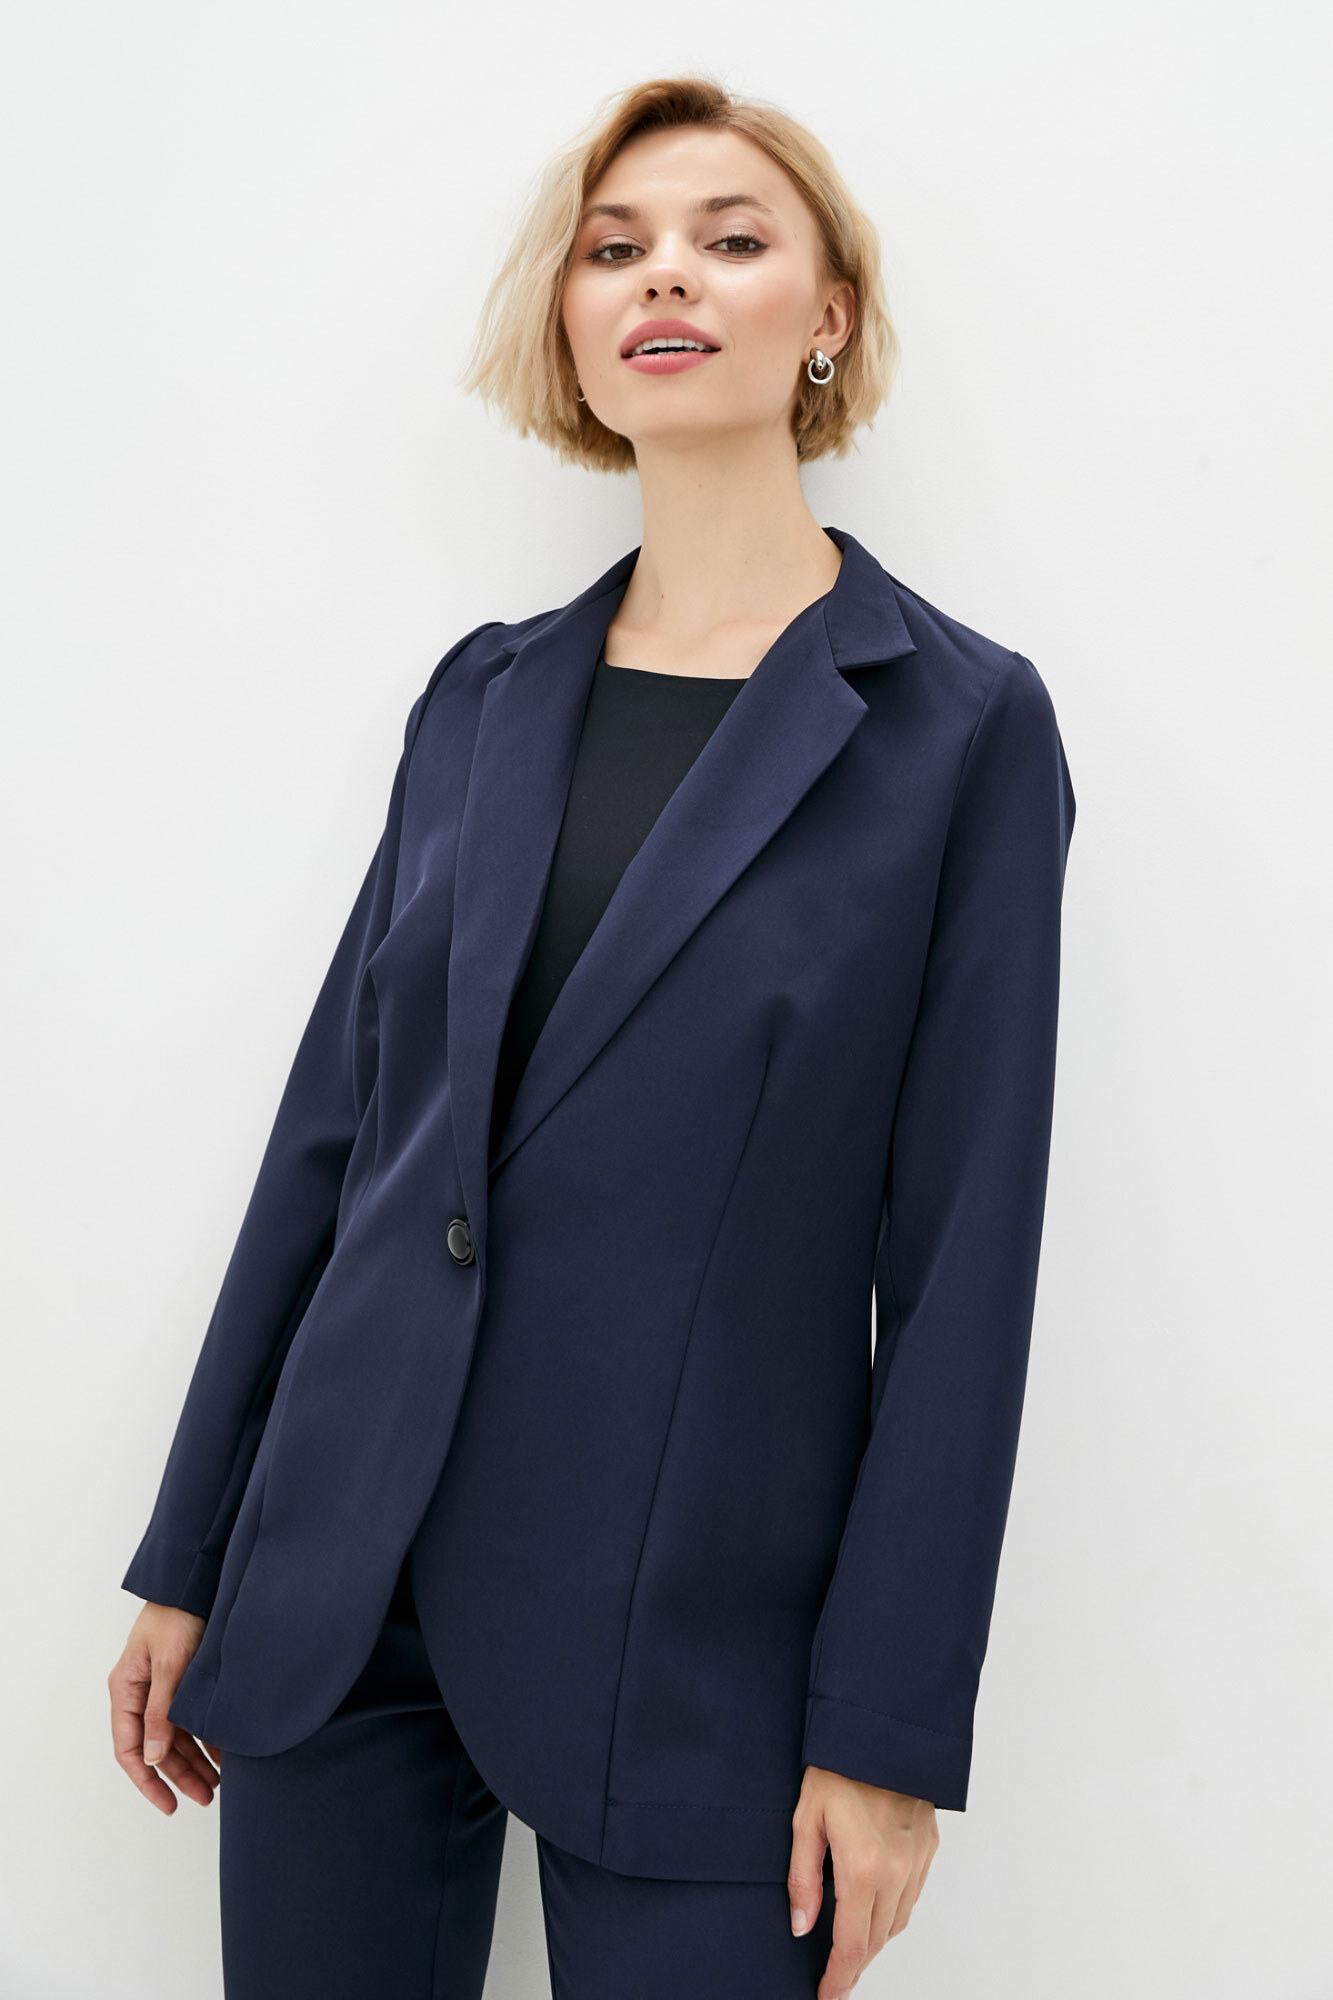 Оверсайз пиджак синего цвета в кэжуал стиле